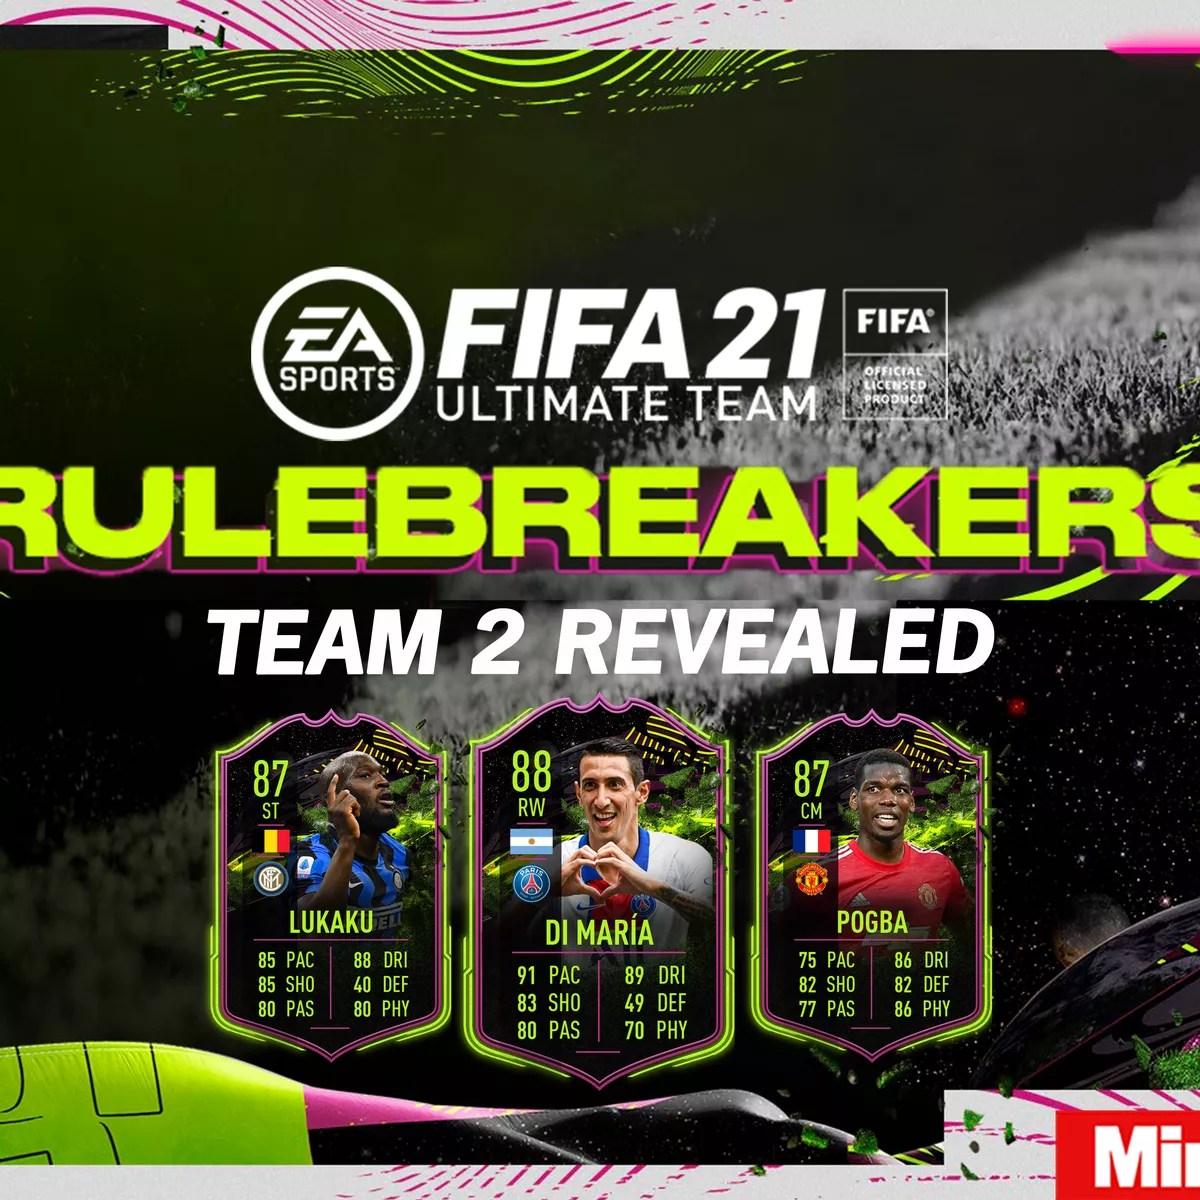 fifa 21 rulebreakers team 2 confirmed